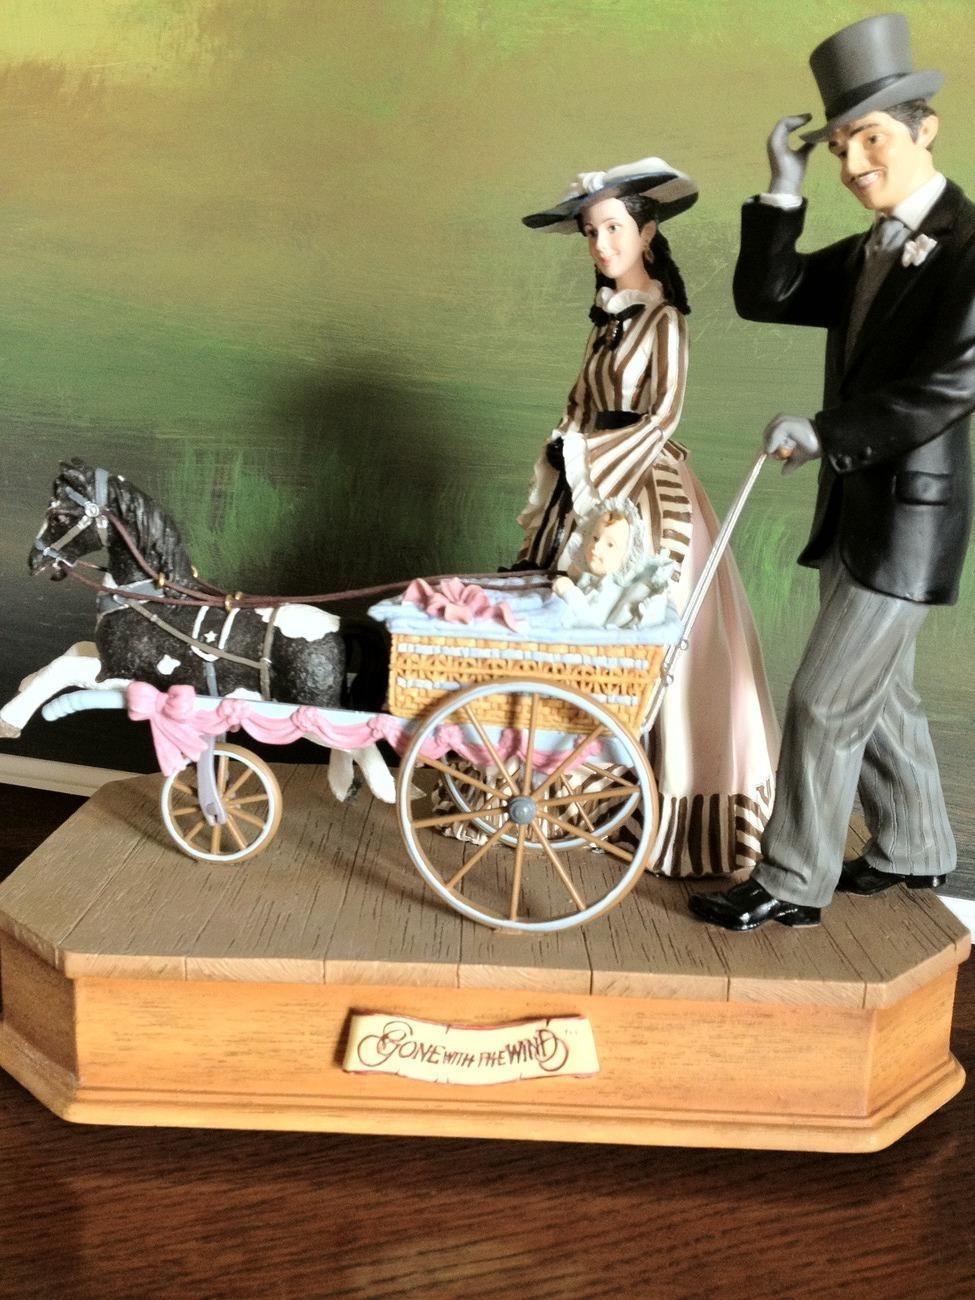 San Francisco Music Box Co - Rhett & Scarlett w/Baby Carriage Gone With the Wind